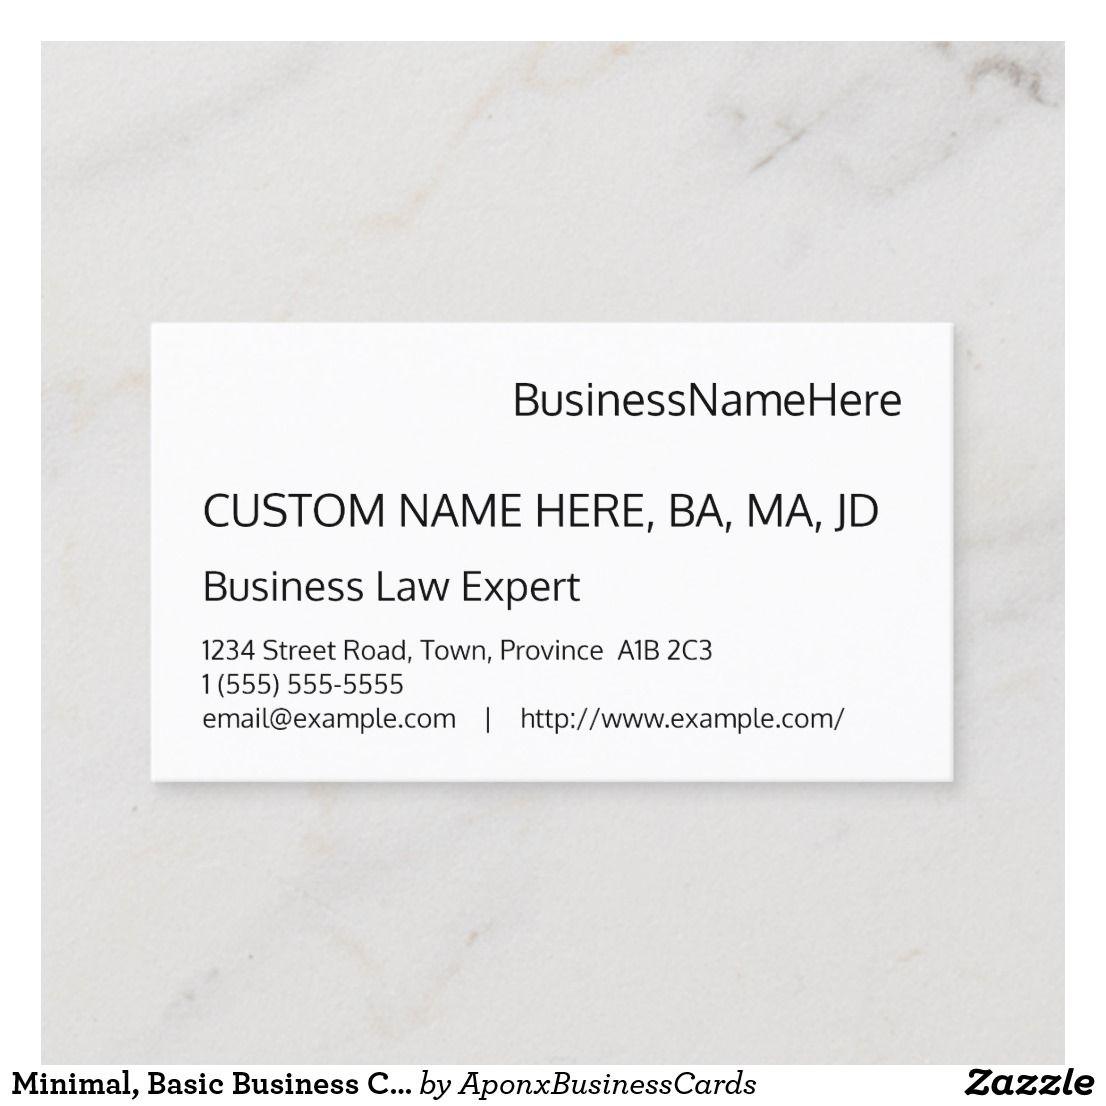 Minimal Basic Business Card Zazzle Com Basic Business Cards Quality Cards